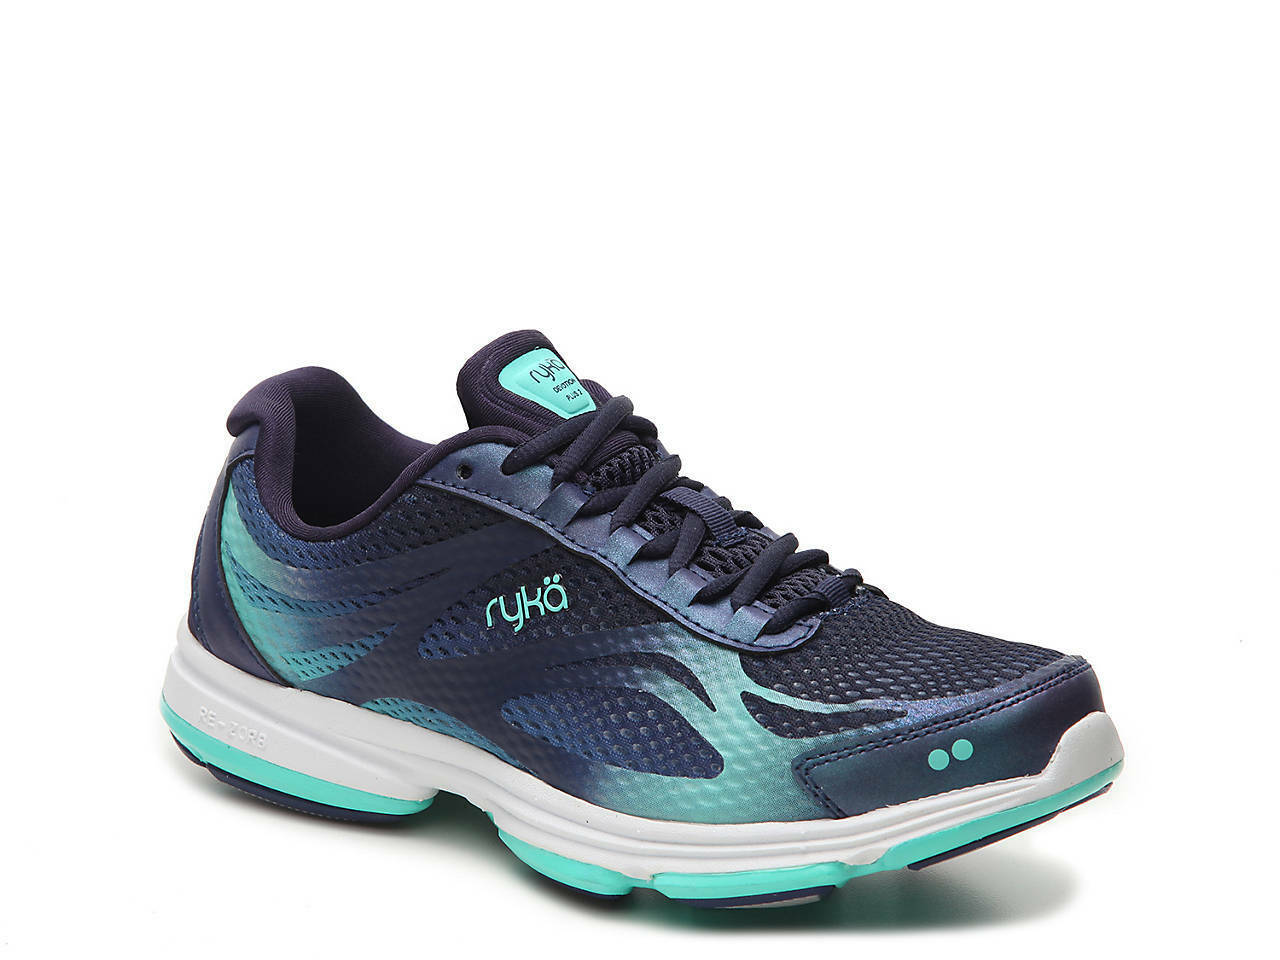 Ryka Devotion plus 2 Walking Chaussures-Femme Chaussures De Sport 8.5 noir turquoise